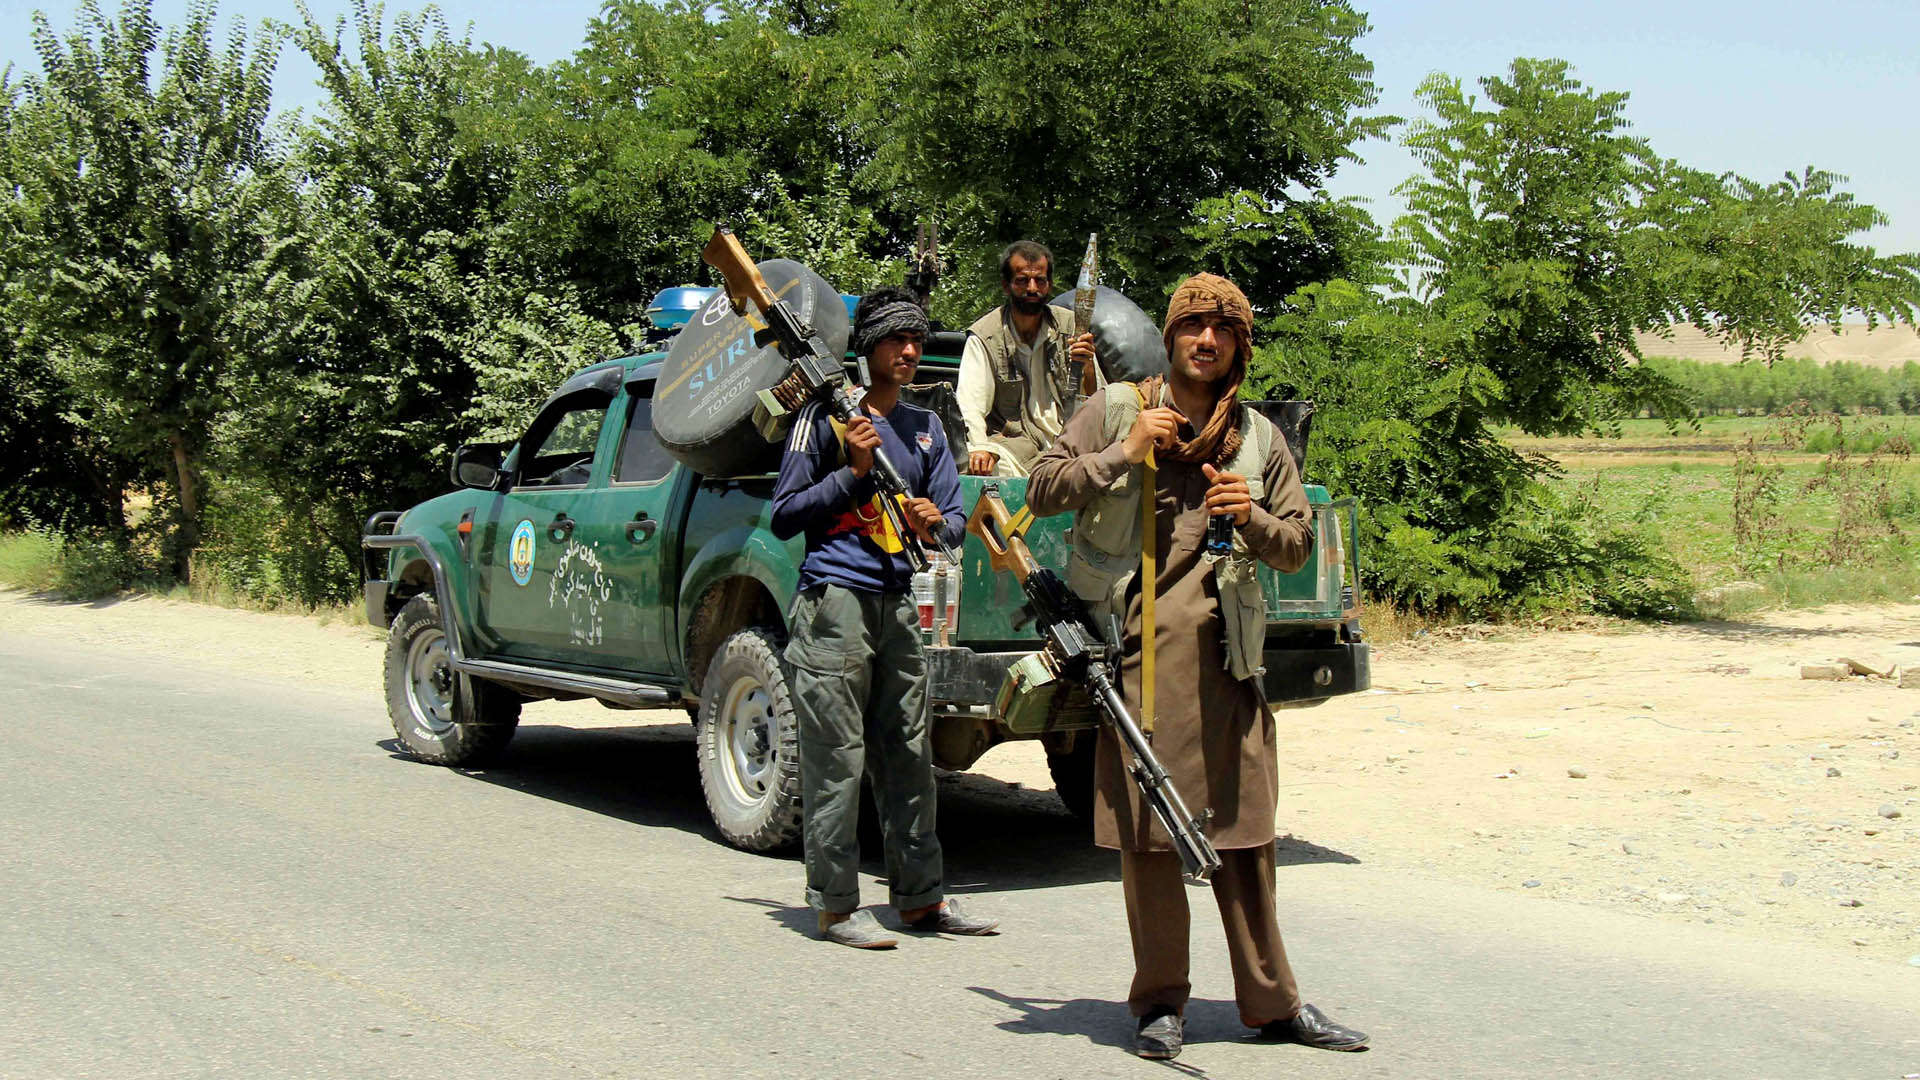 Liberan a pasajeros secuestrados en Afganistán